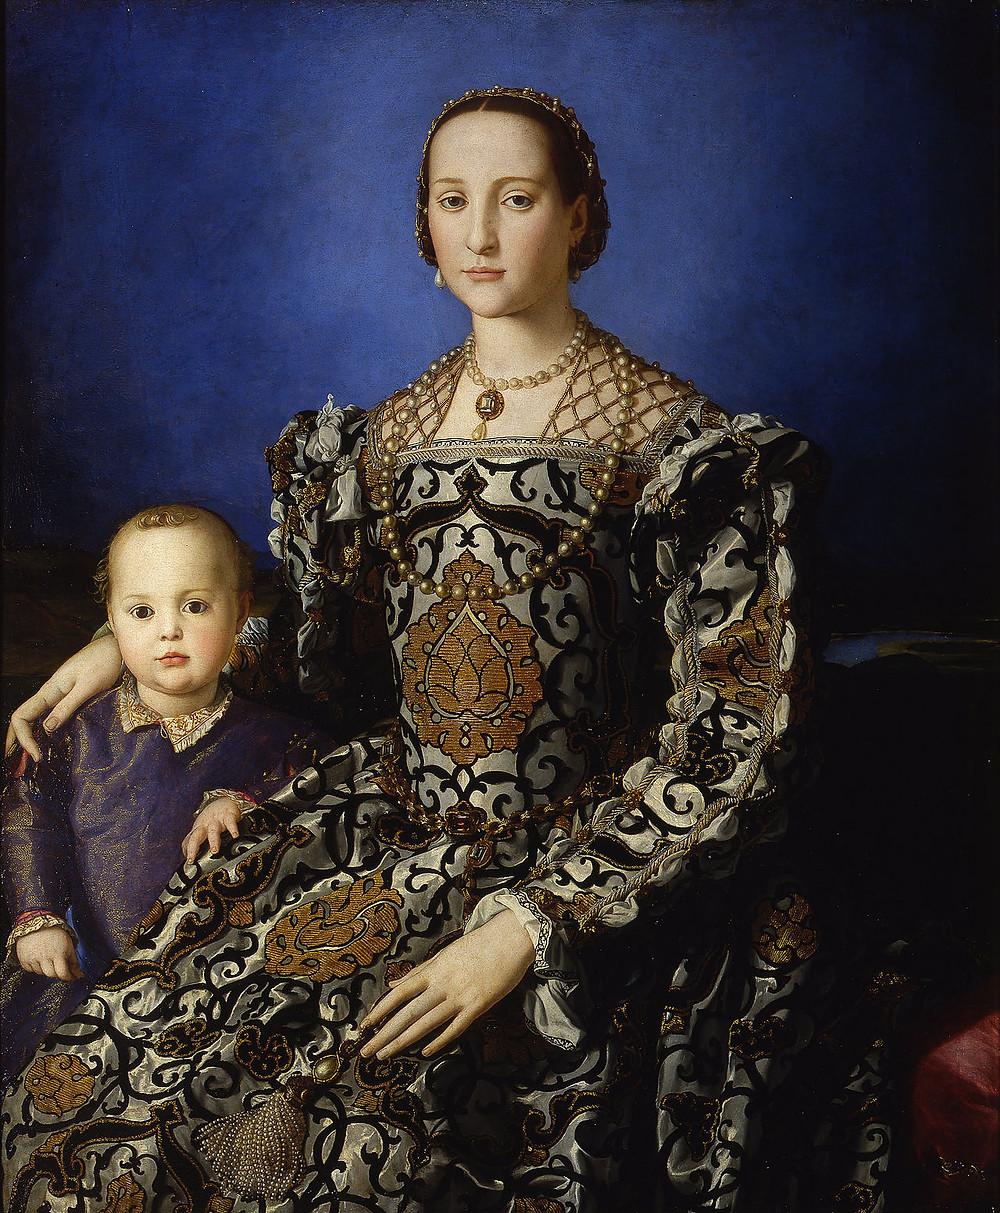 Bronzino, Eleanora di Toledo, 1545 -- in the Uffizi Gallery